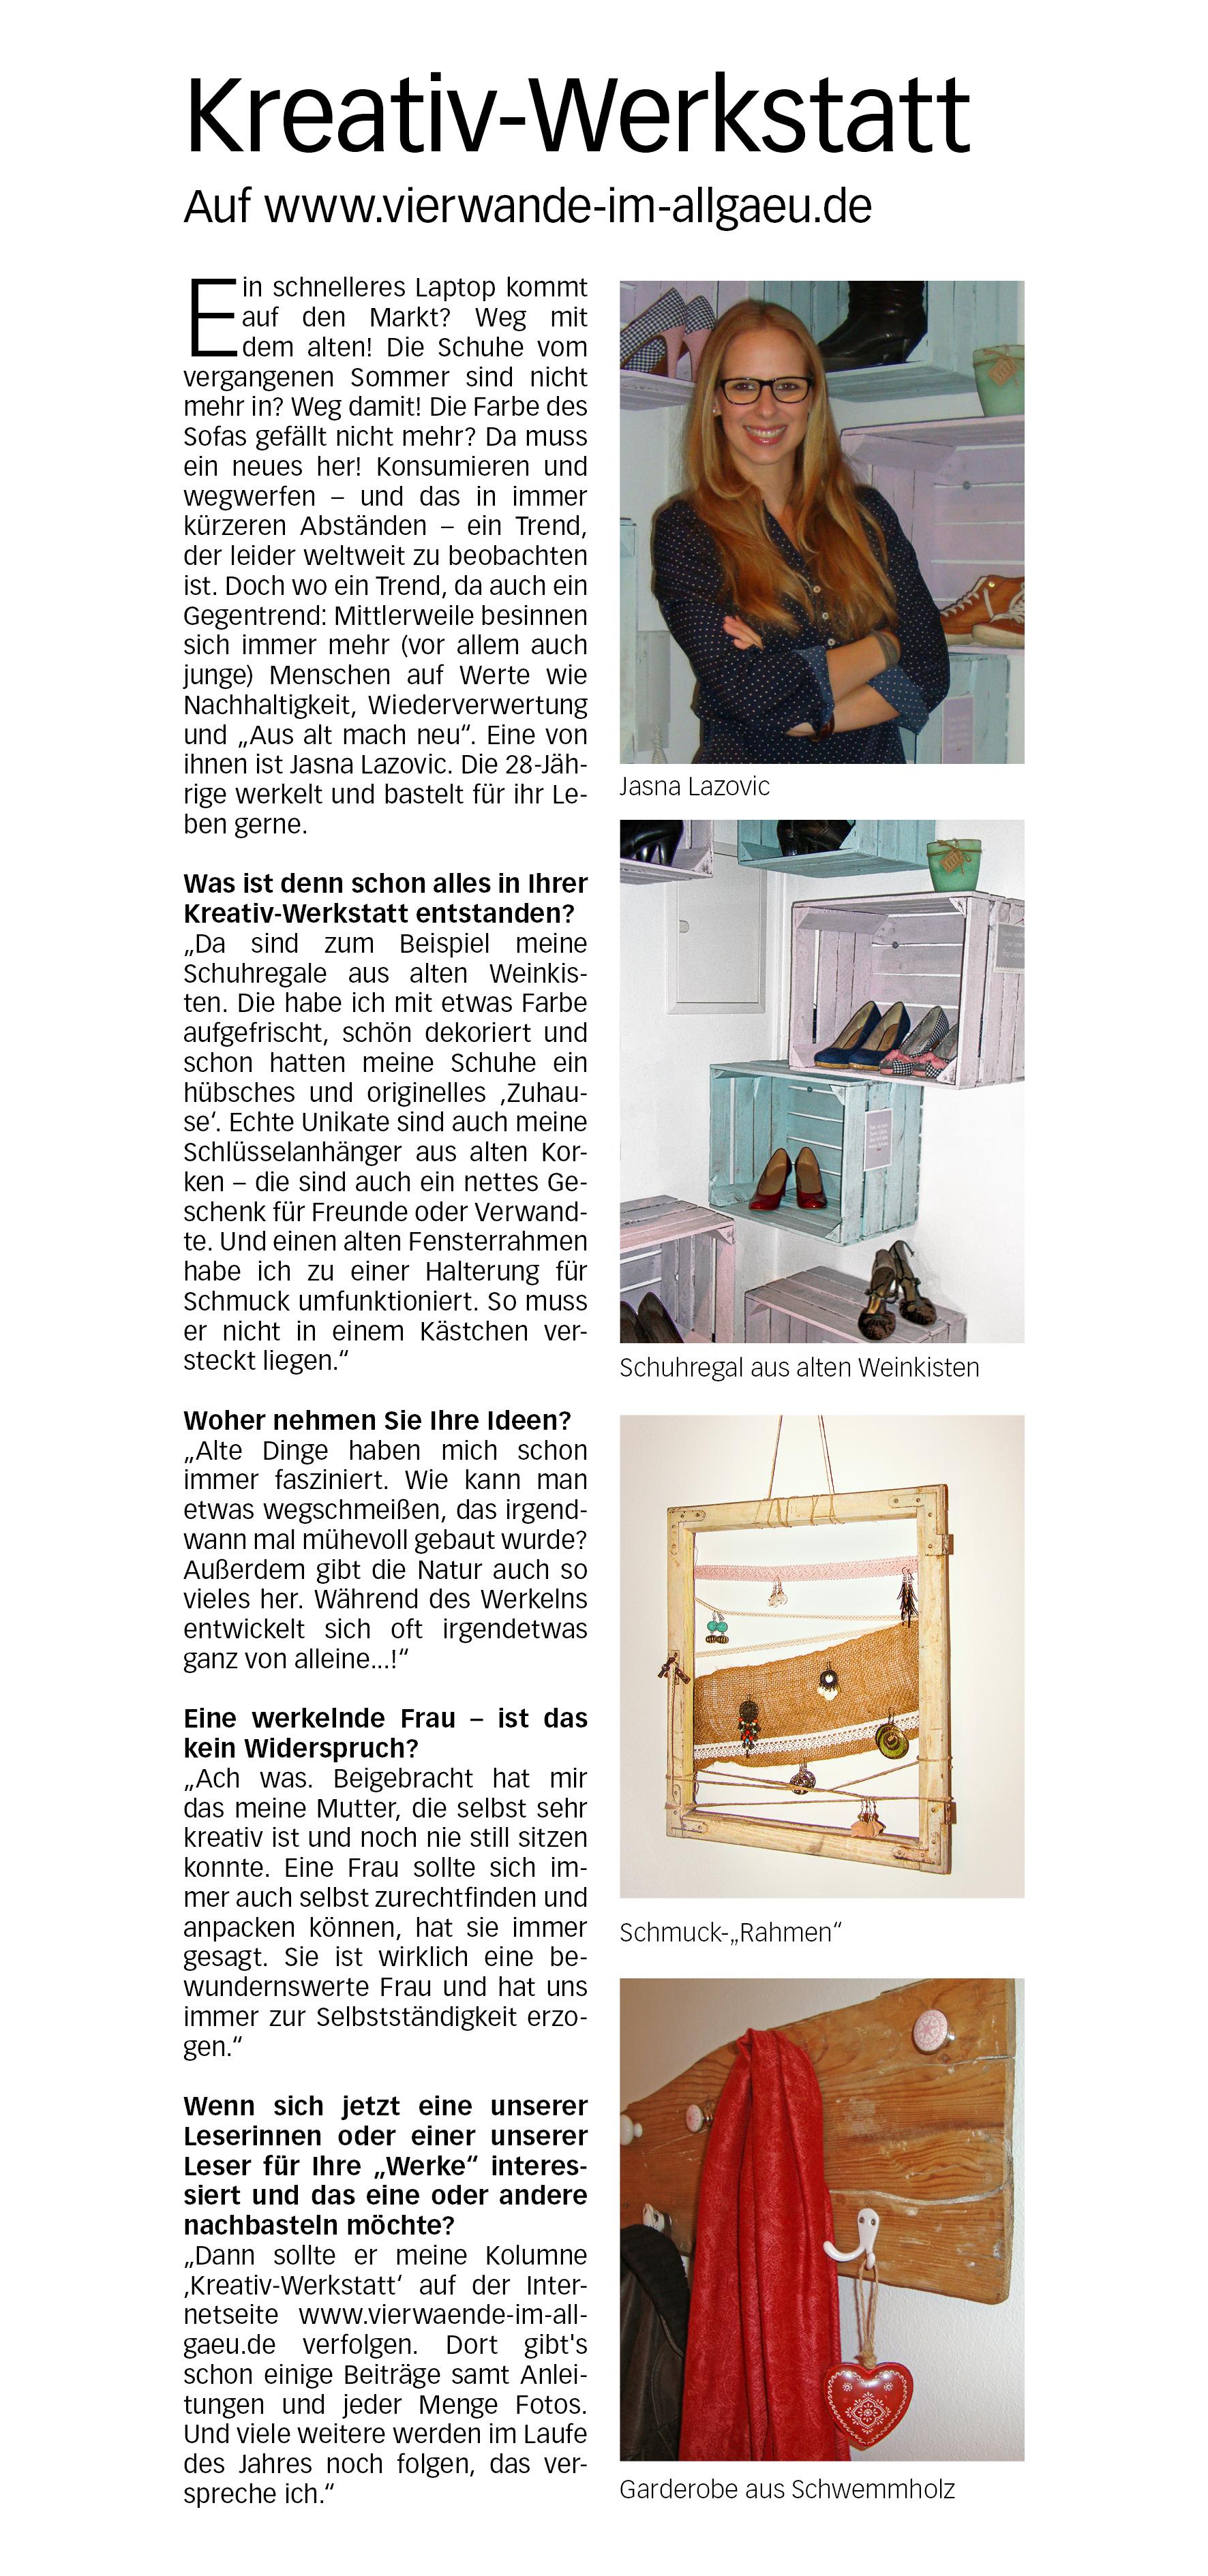 Charmant Cataraft Rahmen Ideen - Rahmen Ideen - markjohnsonshow.info